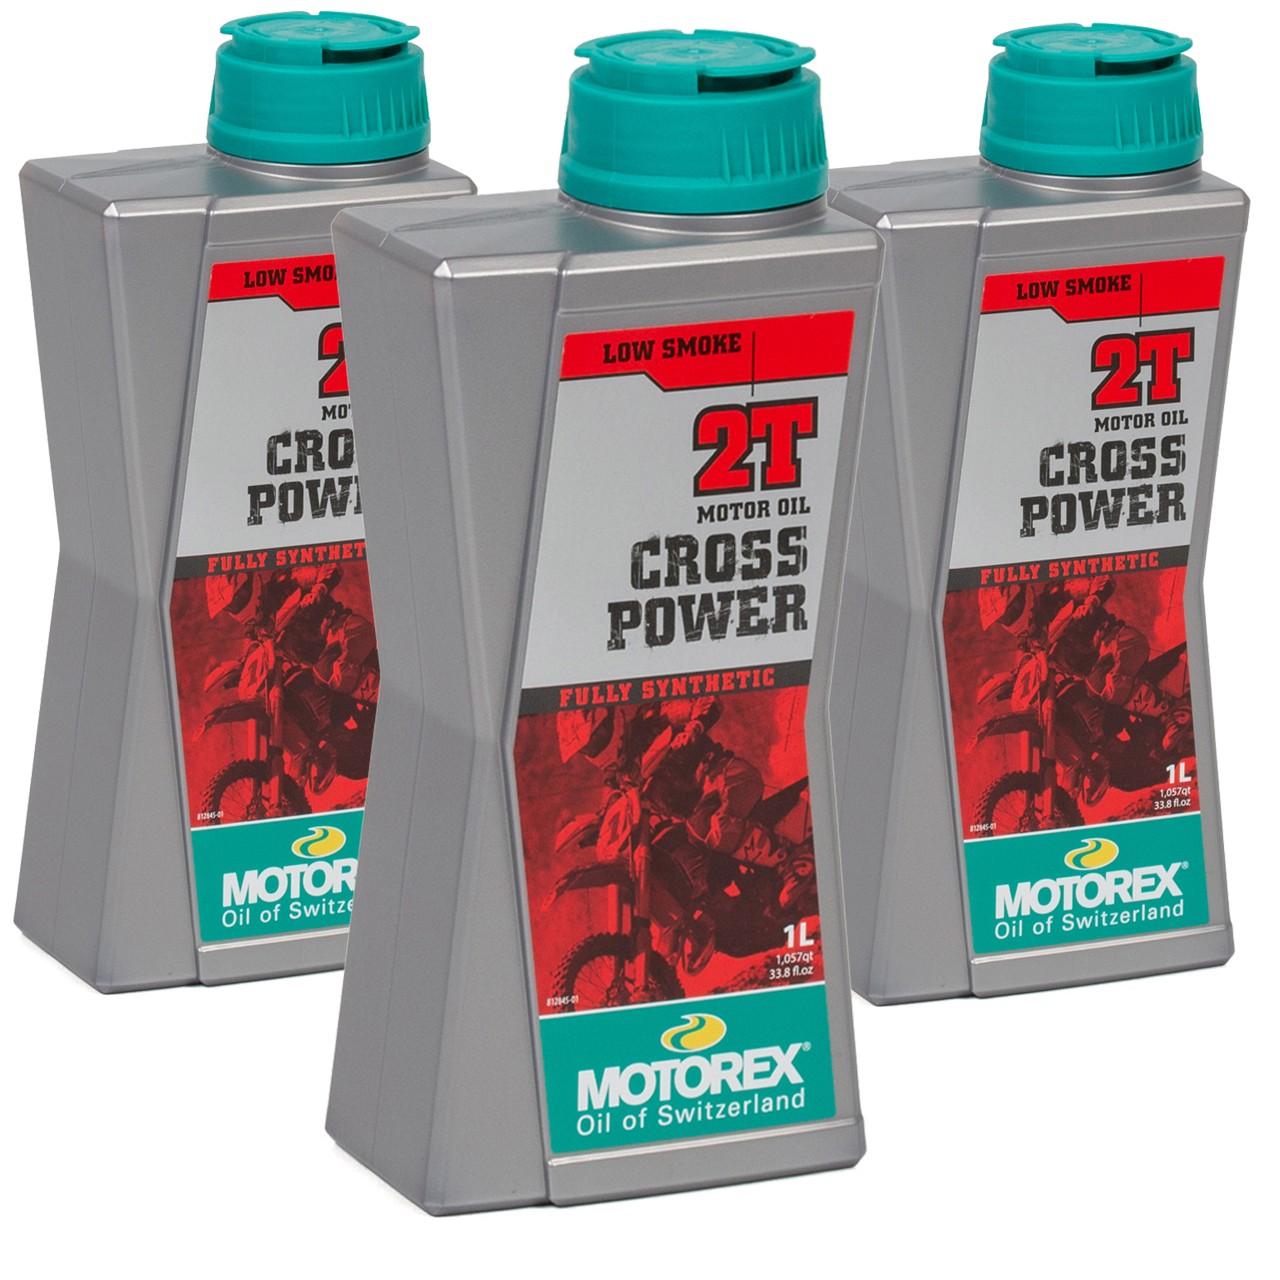 MOTOREX Cross Power 2T LOW SMOKE Motoröl API TC JASO FD ISO-L-EGD - 3L 3 Liter